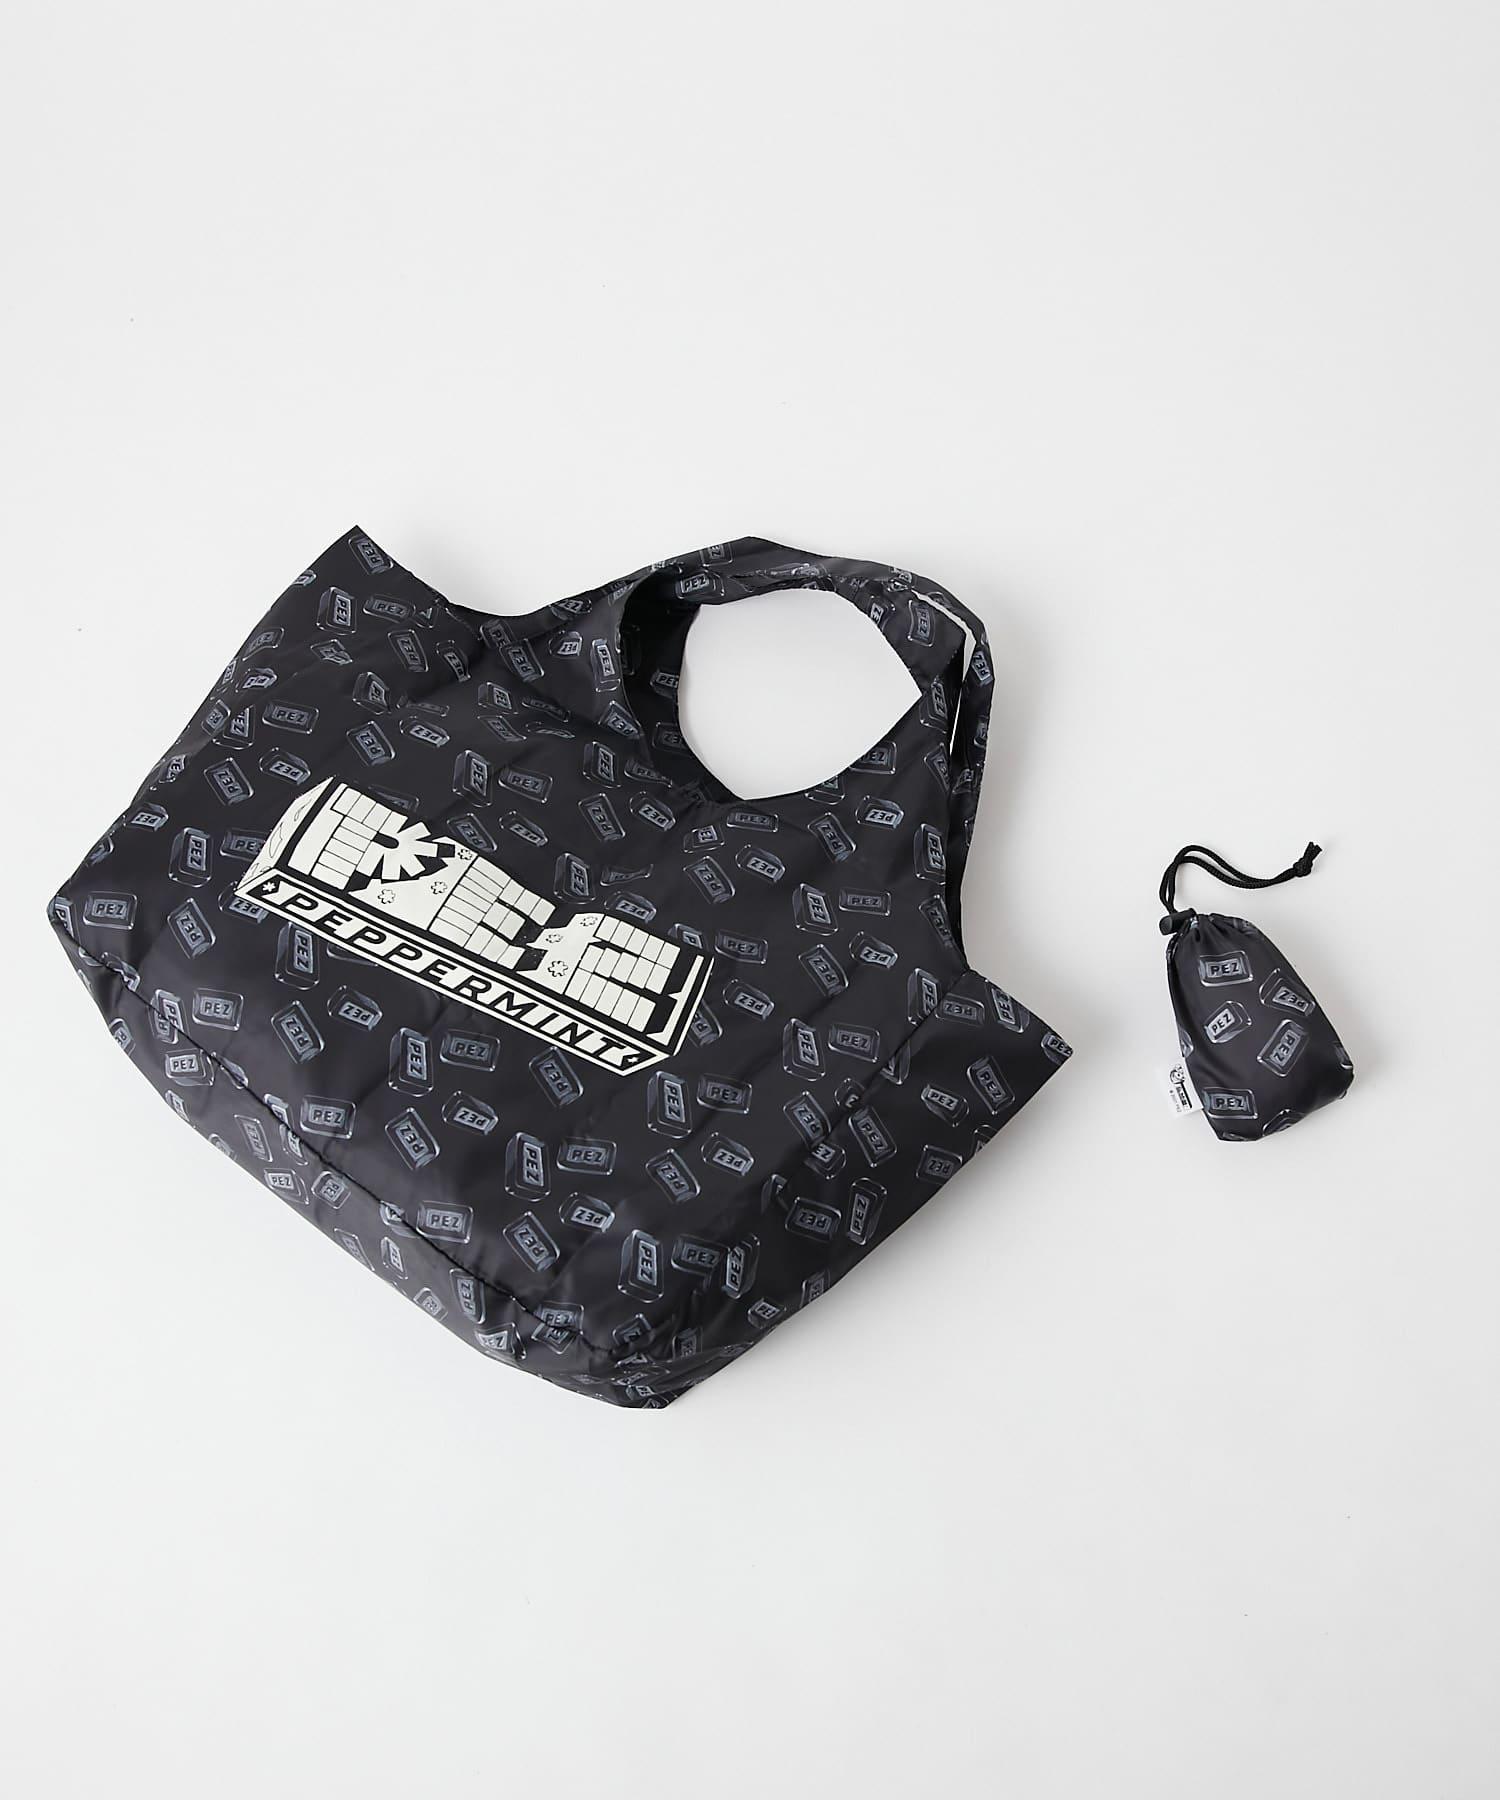 ear PAPILLONNER(イア パピヨネ) 動画【PEZ(ペッツ)×ear】オリジナルロゴエコバッグ 収納用巾着つき